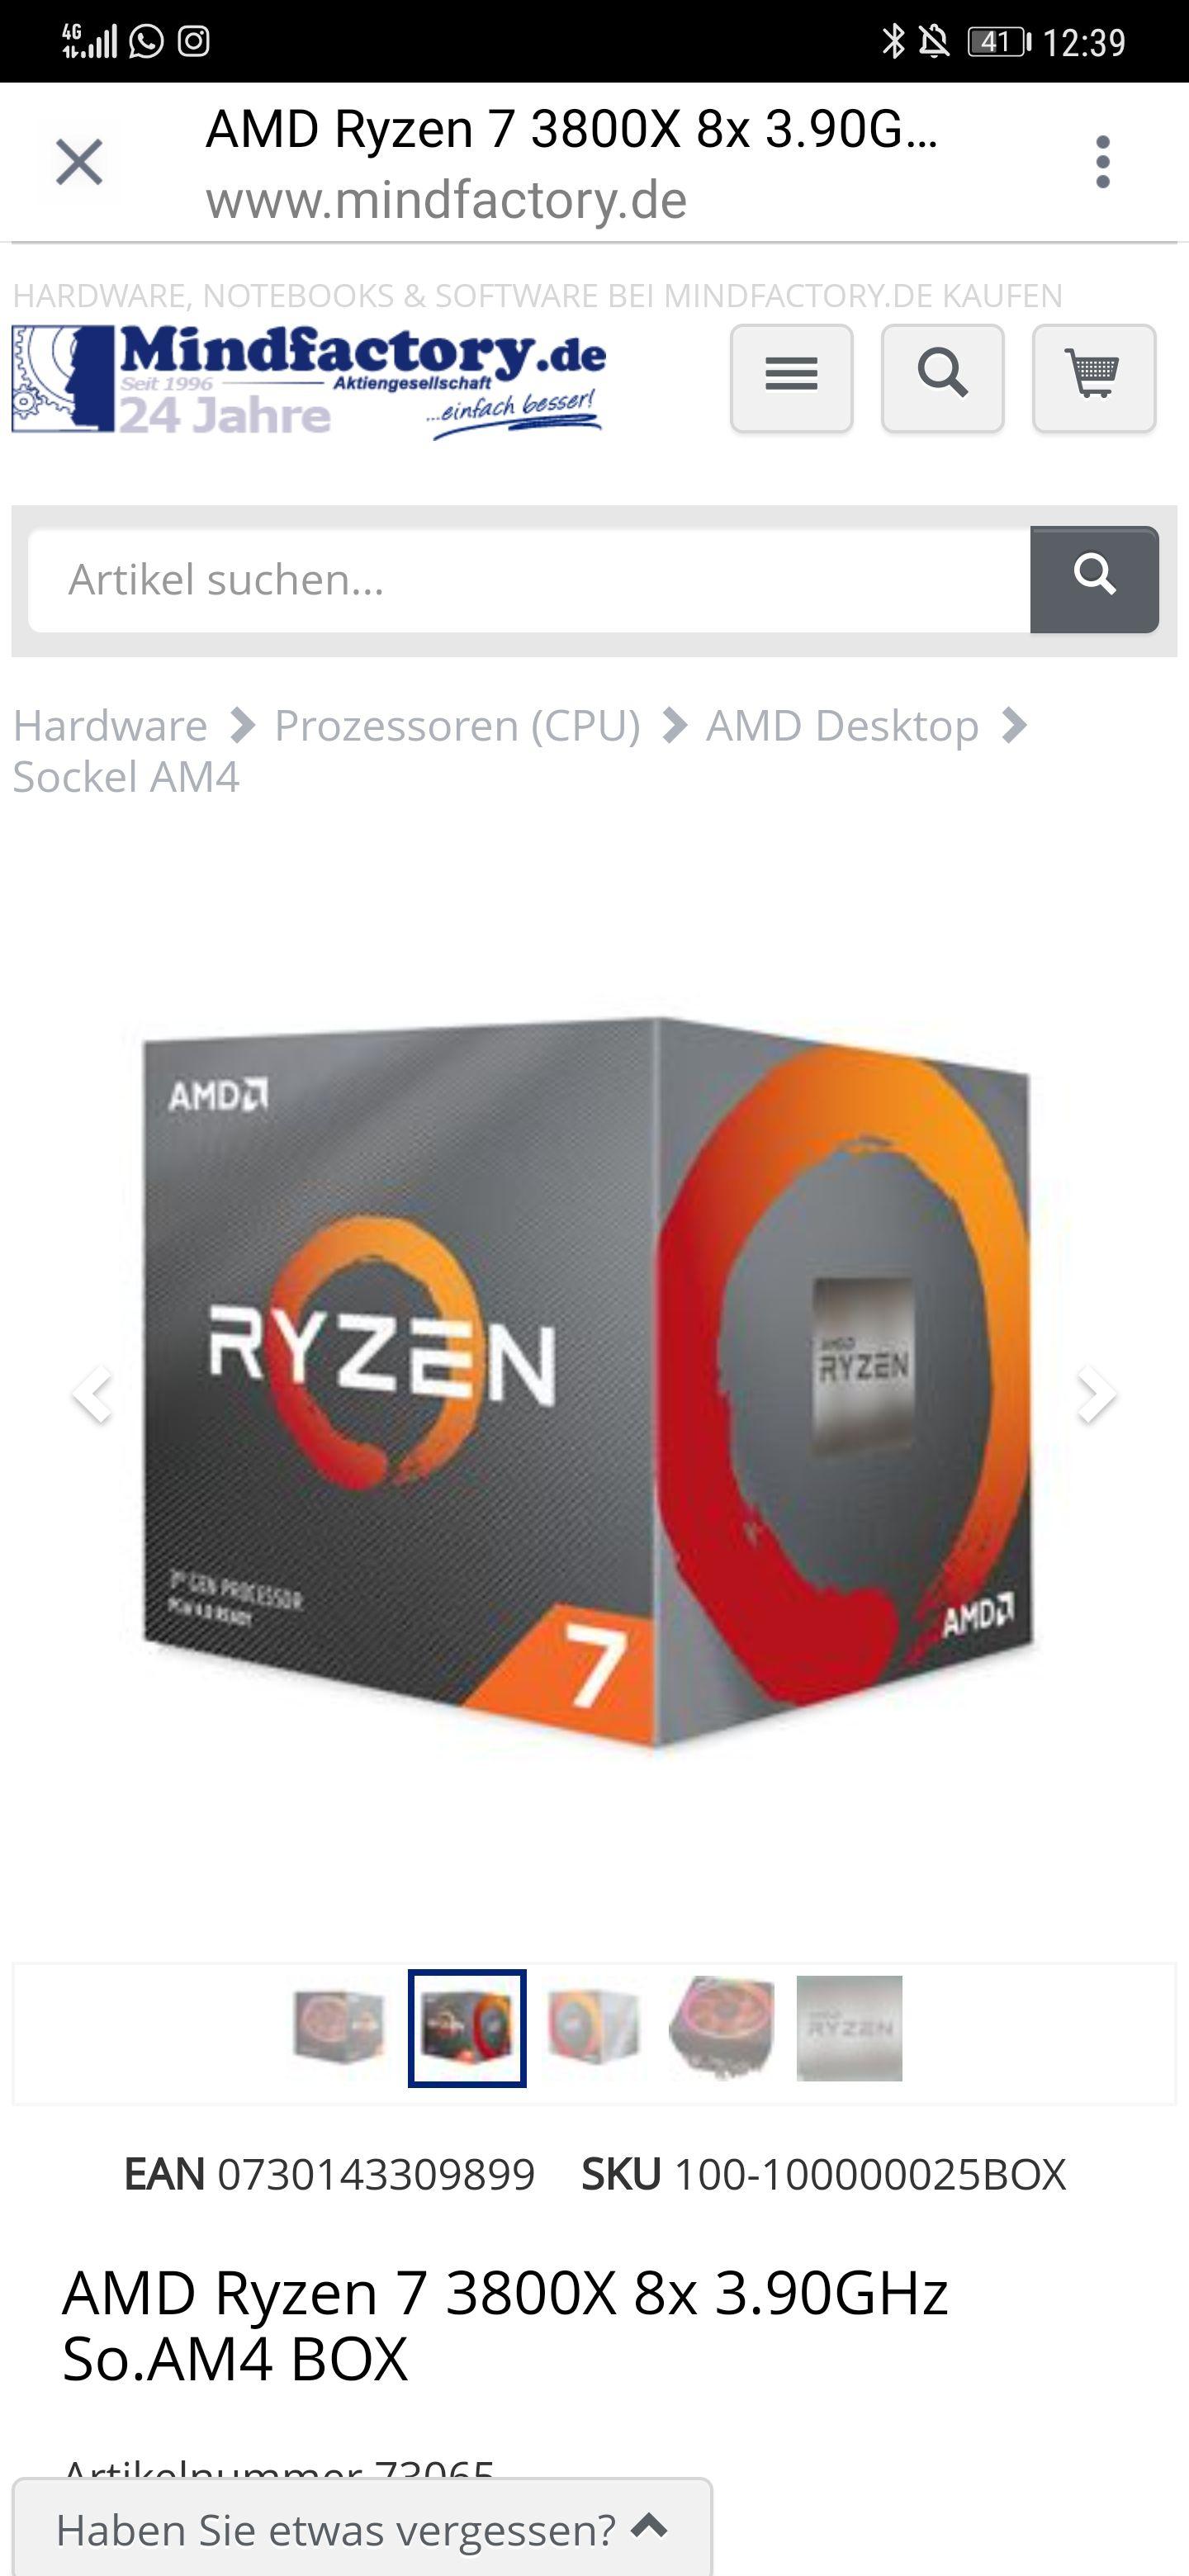 AMD Ryzen 7 3800X 8x 3.90GHz So.AM4 BOX Bei Mindfactory